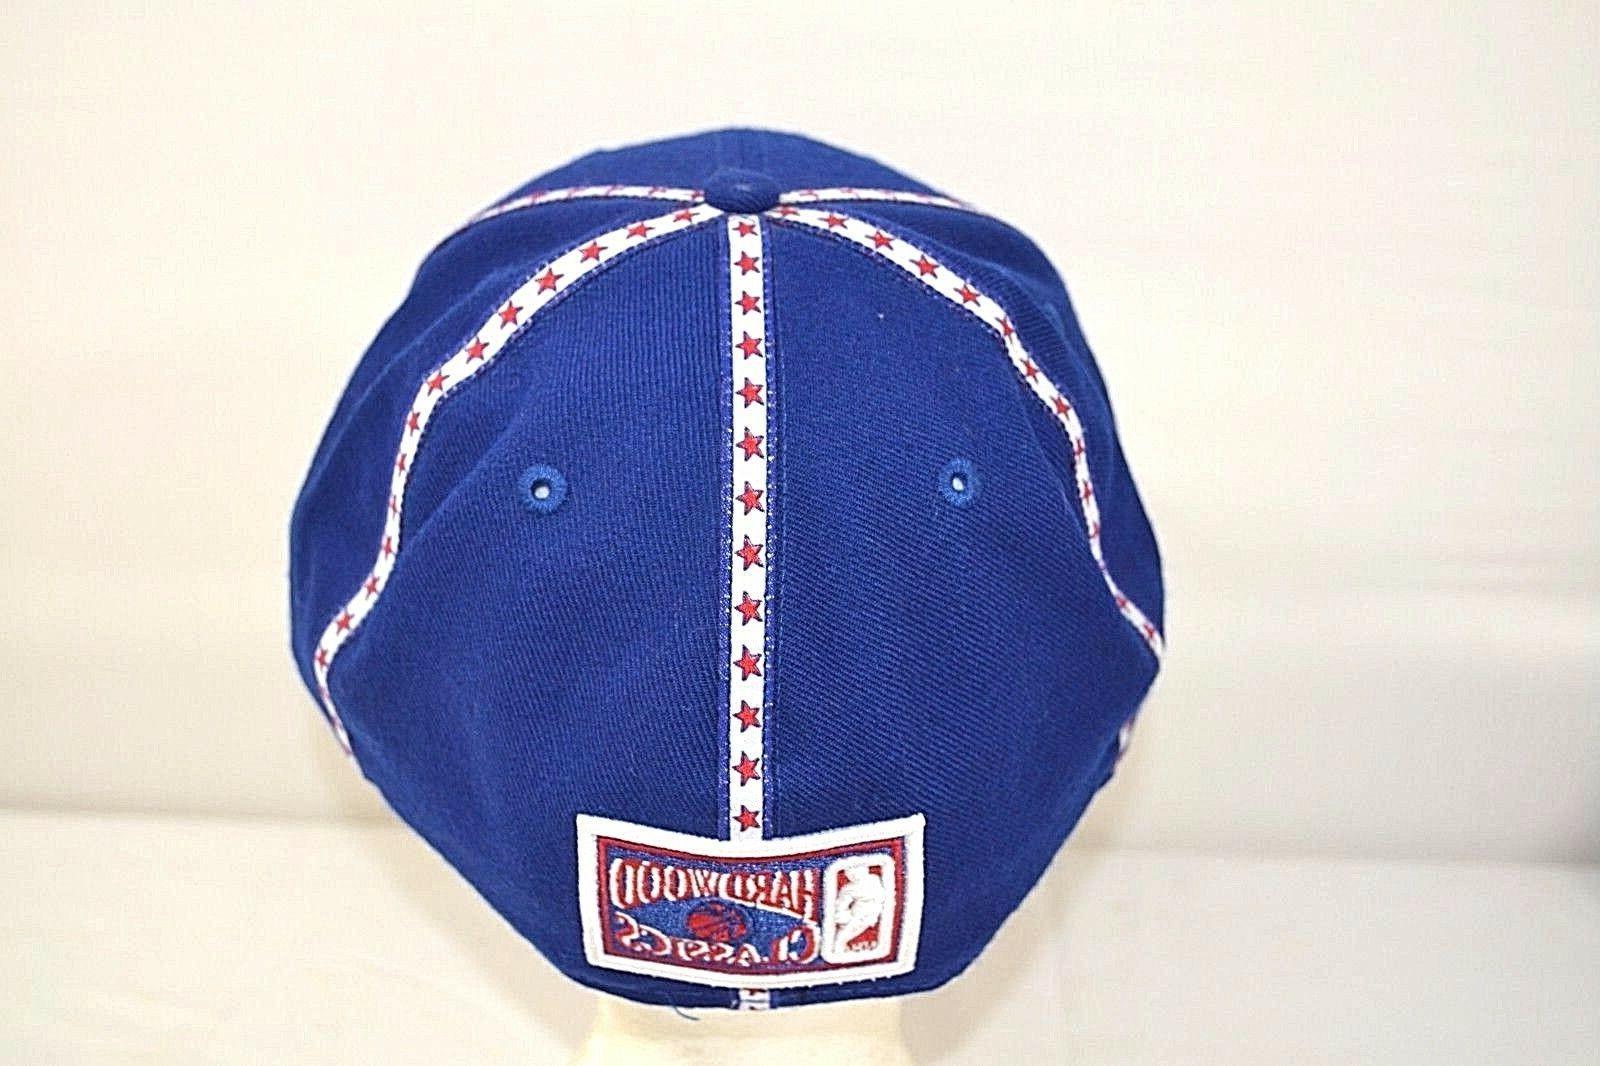 Denver Nuggets Basket Ball Blue Cap 7-1/4